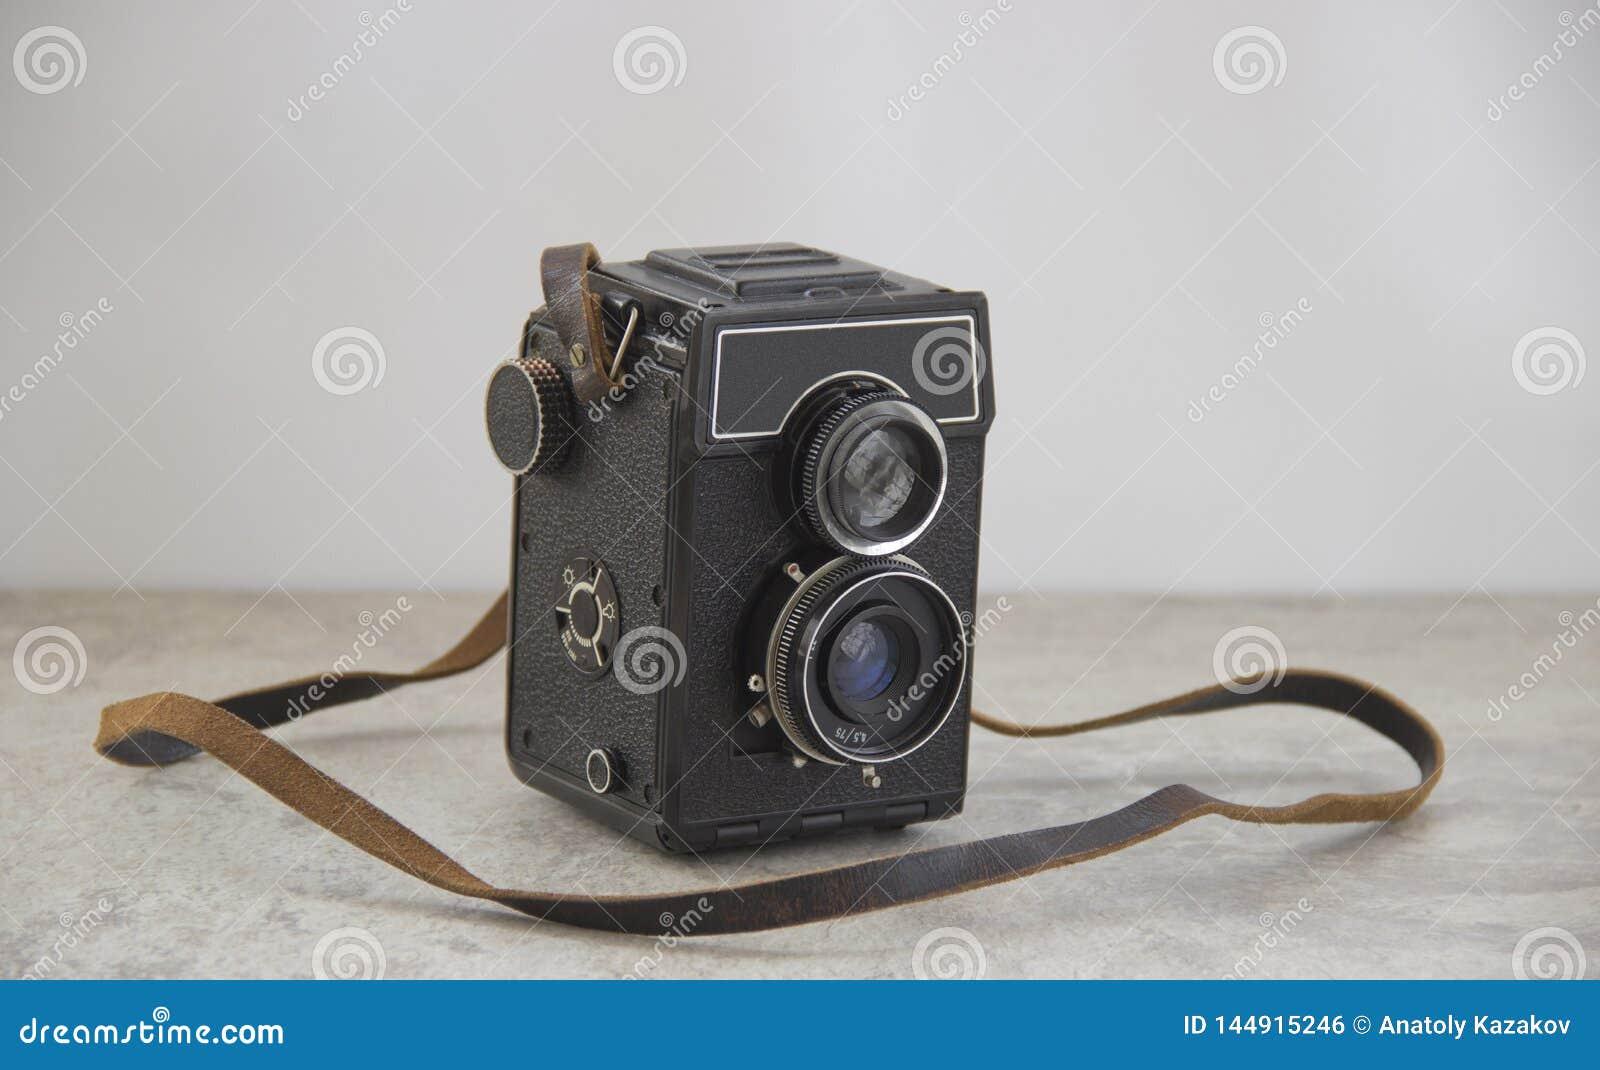 Vintage camera with strap